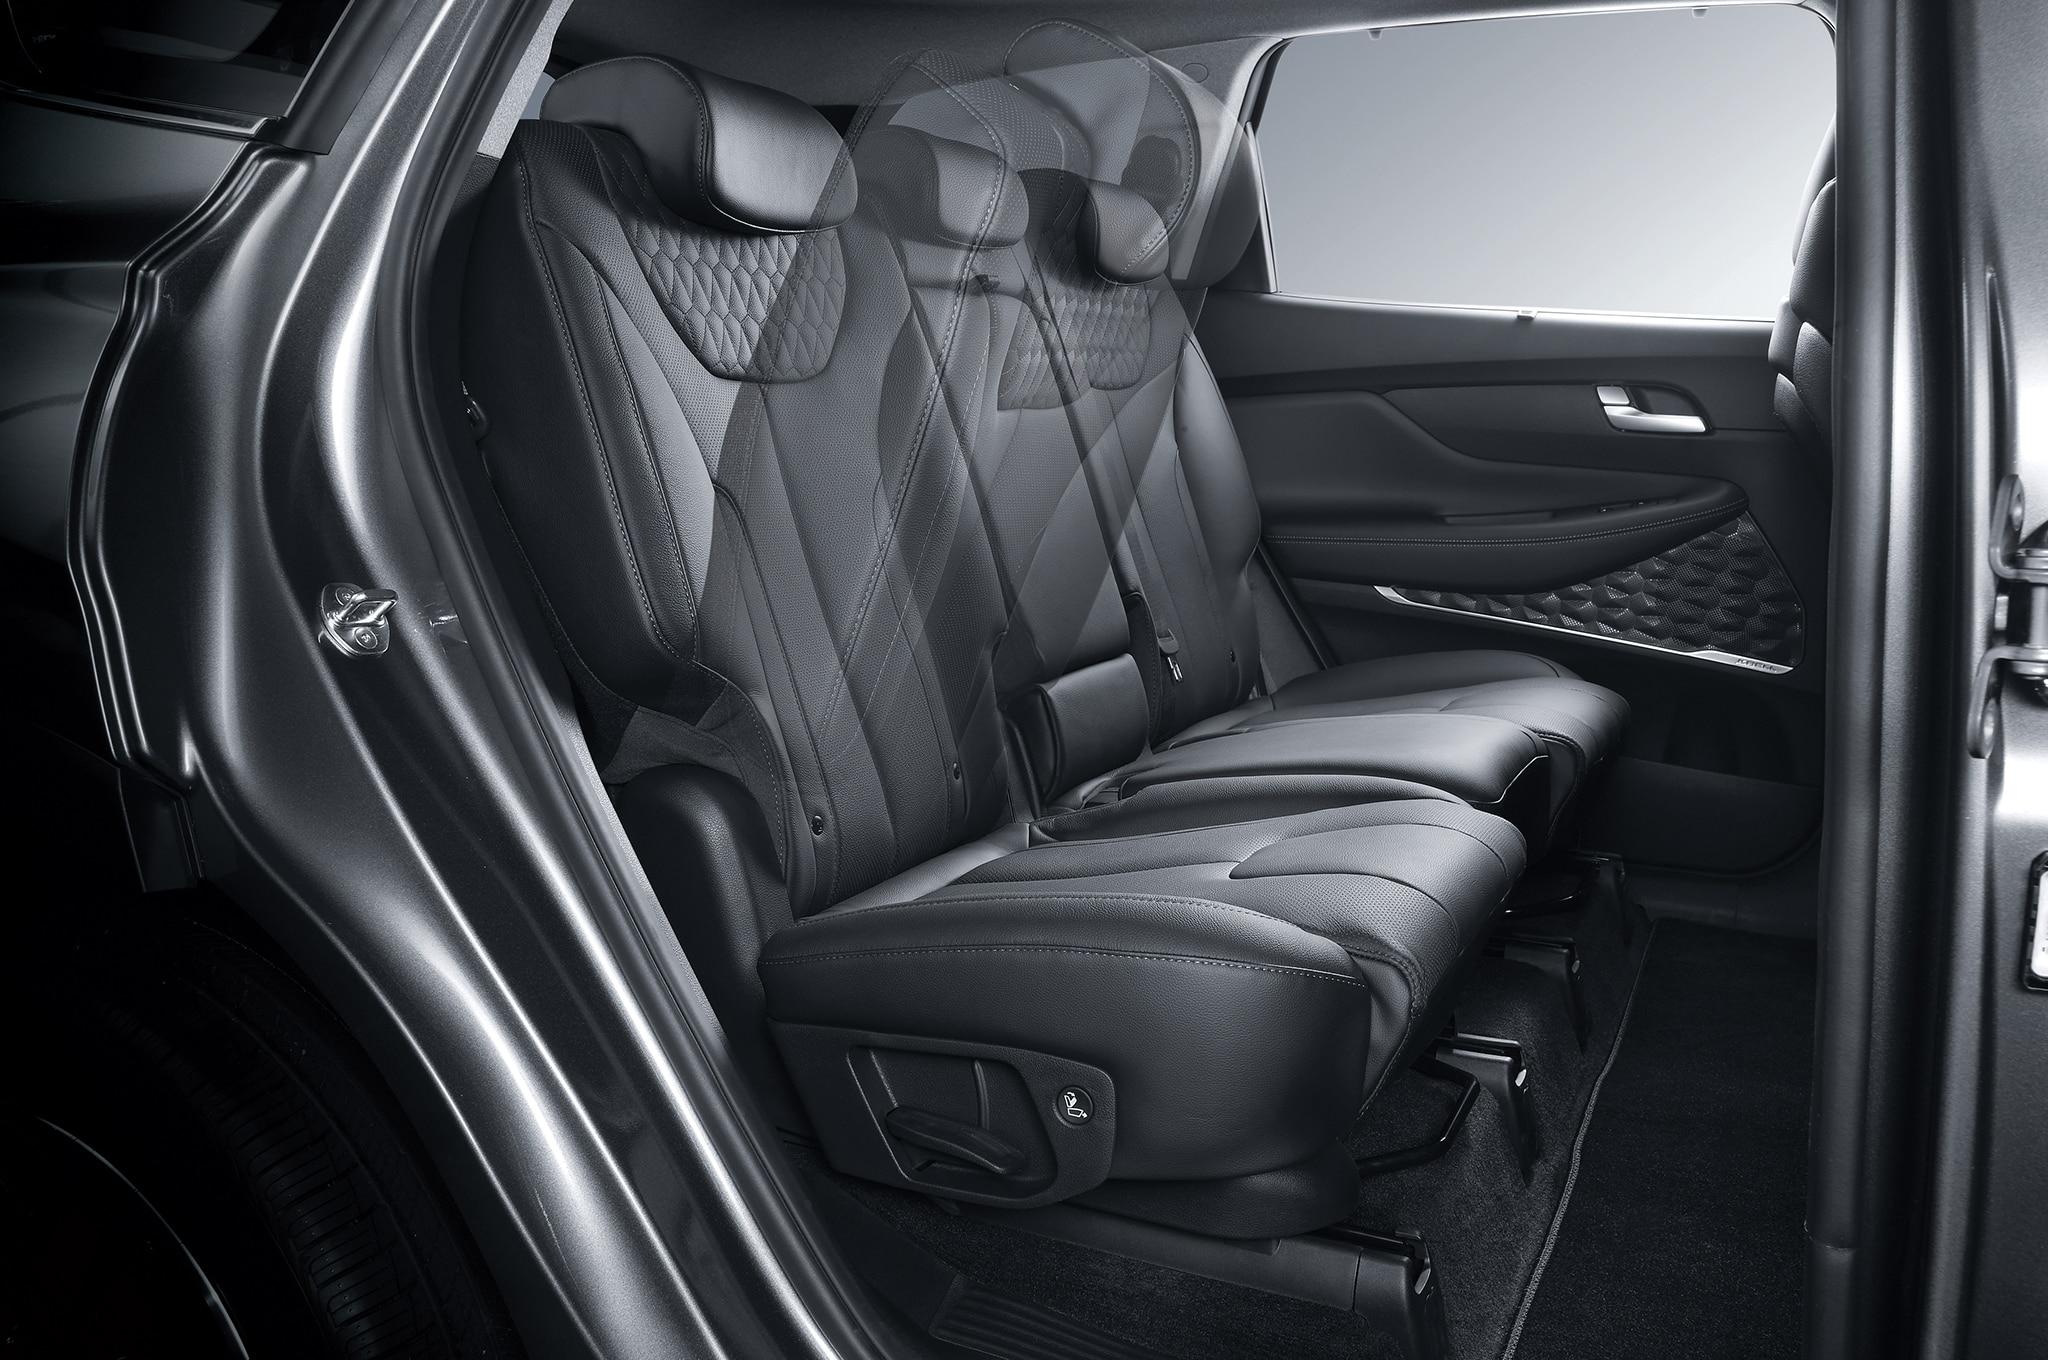 2019 Hyundai Santa Fe Getting A Diesel Option